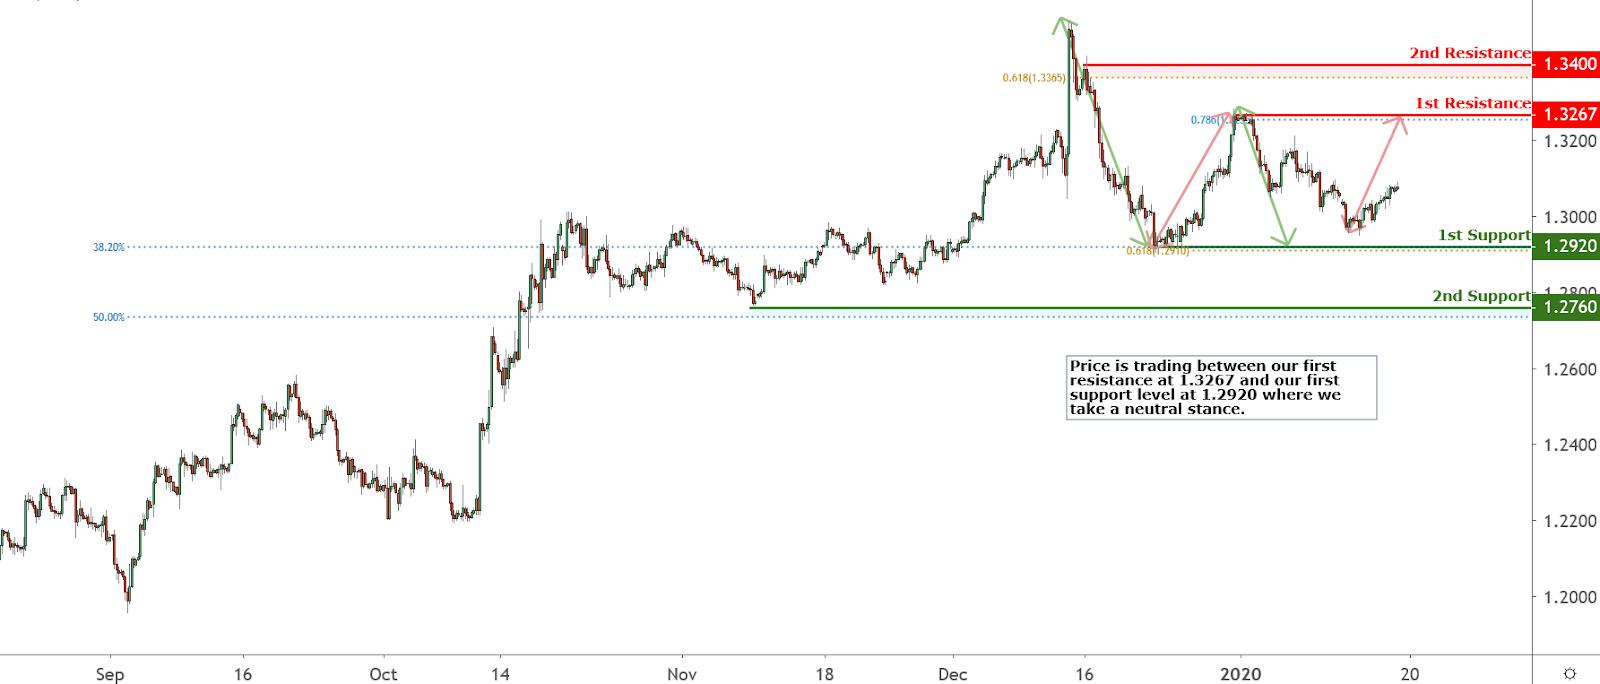 GBPUSD Chart, Source: TradingView.com